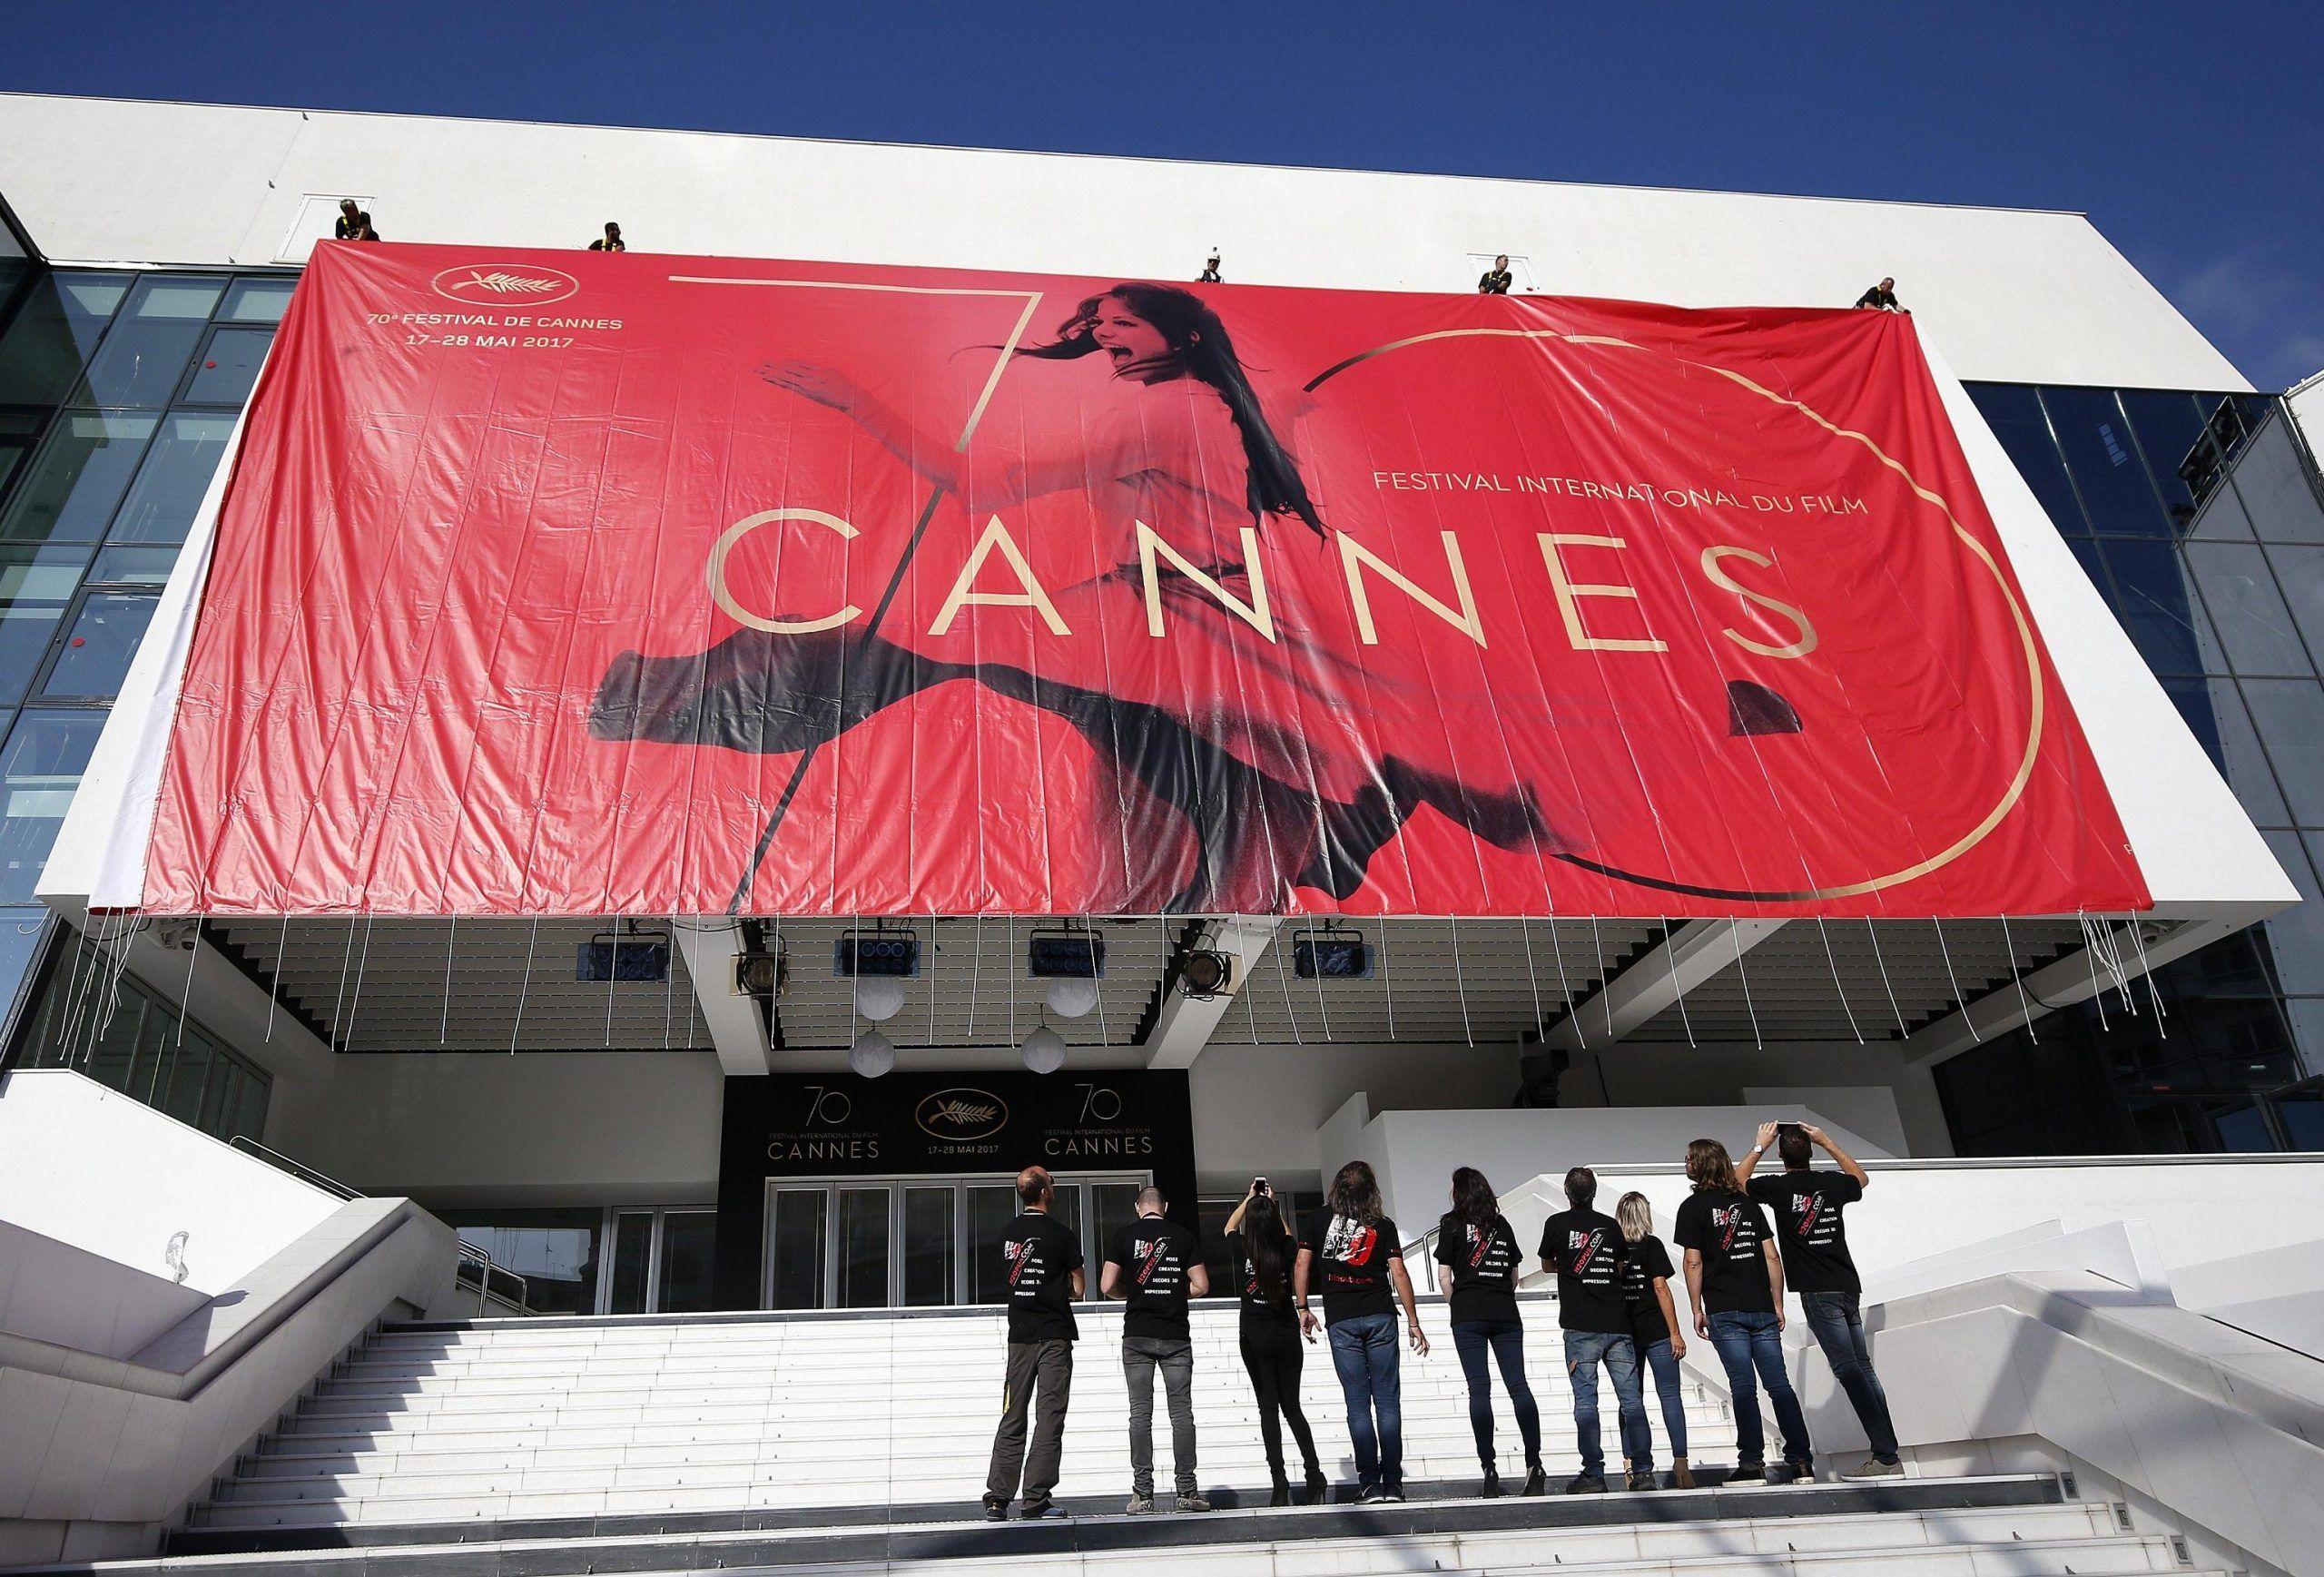 Festival di Cannes 2017 date biglietti attori ospiti film